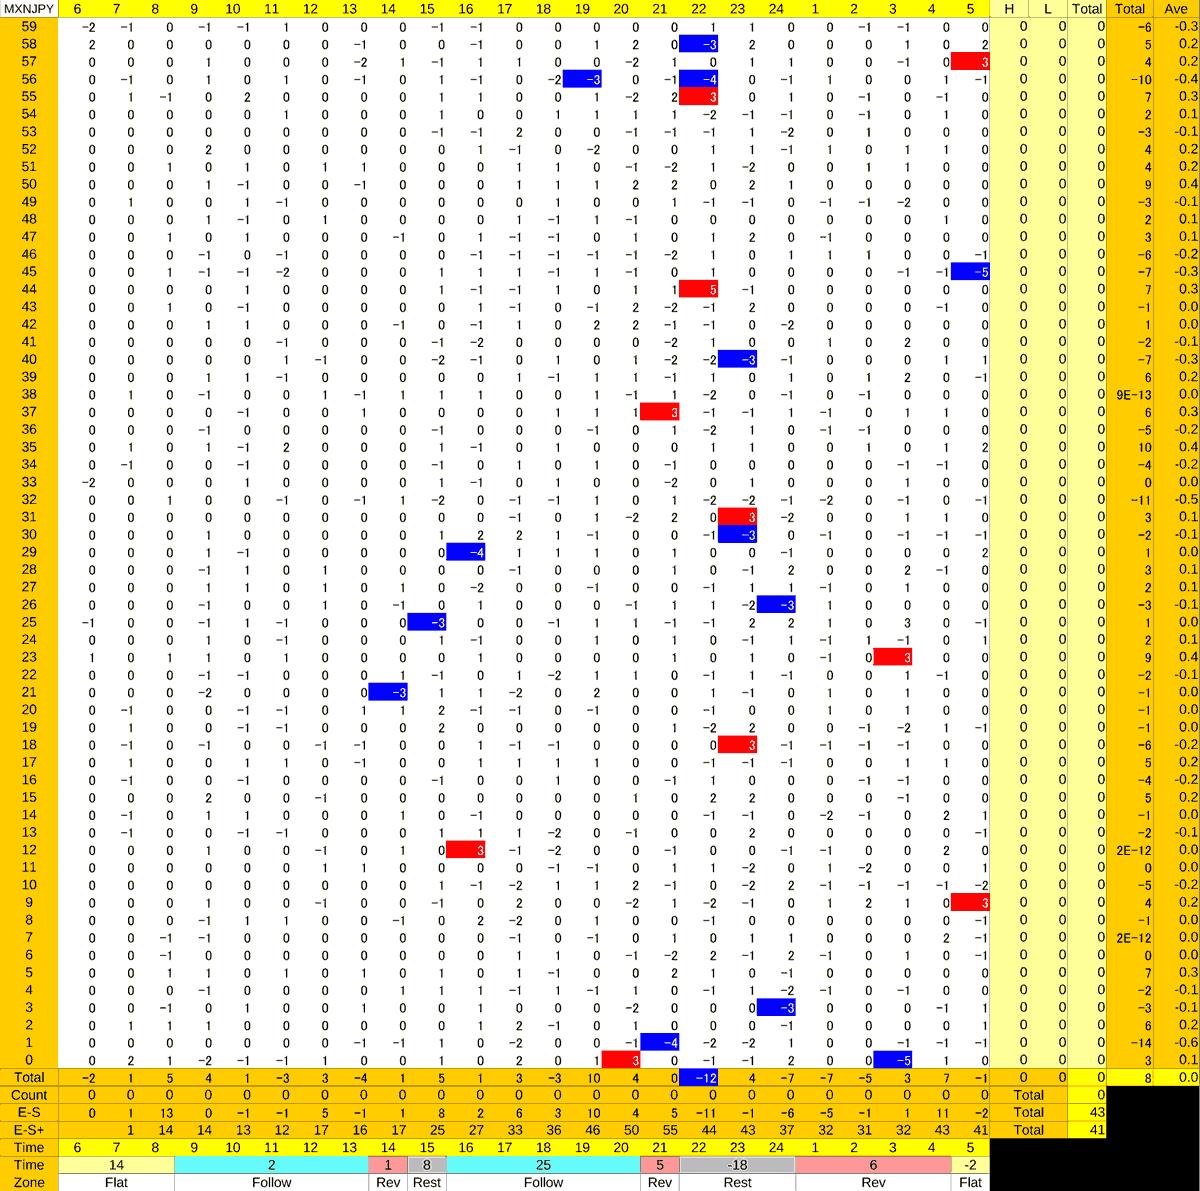 20200825_HS(3)MXNJPY